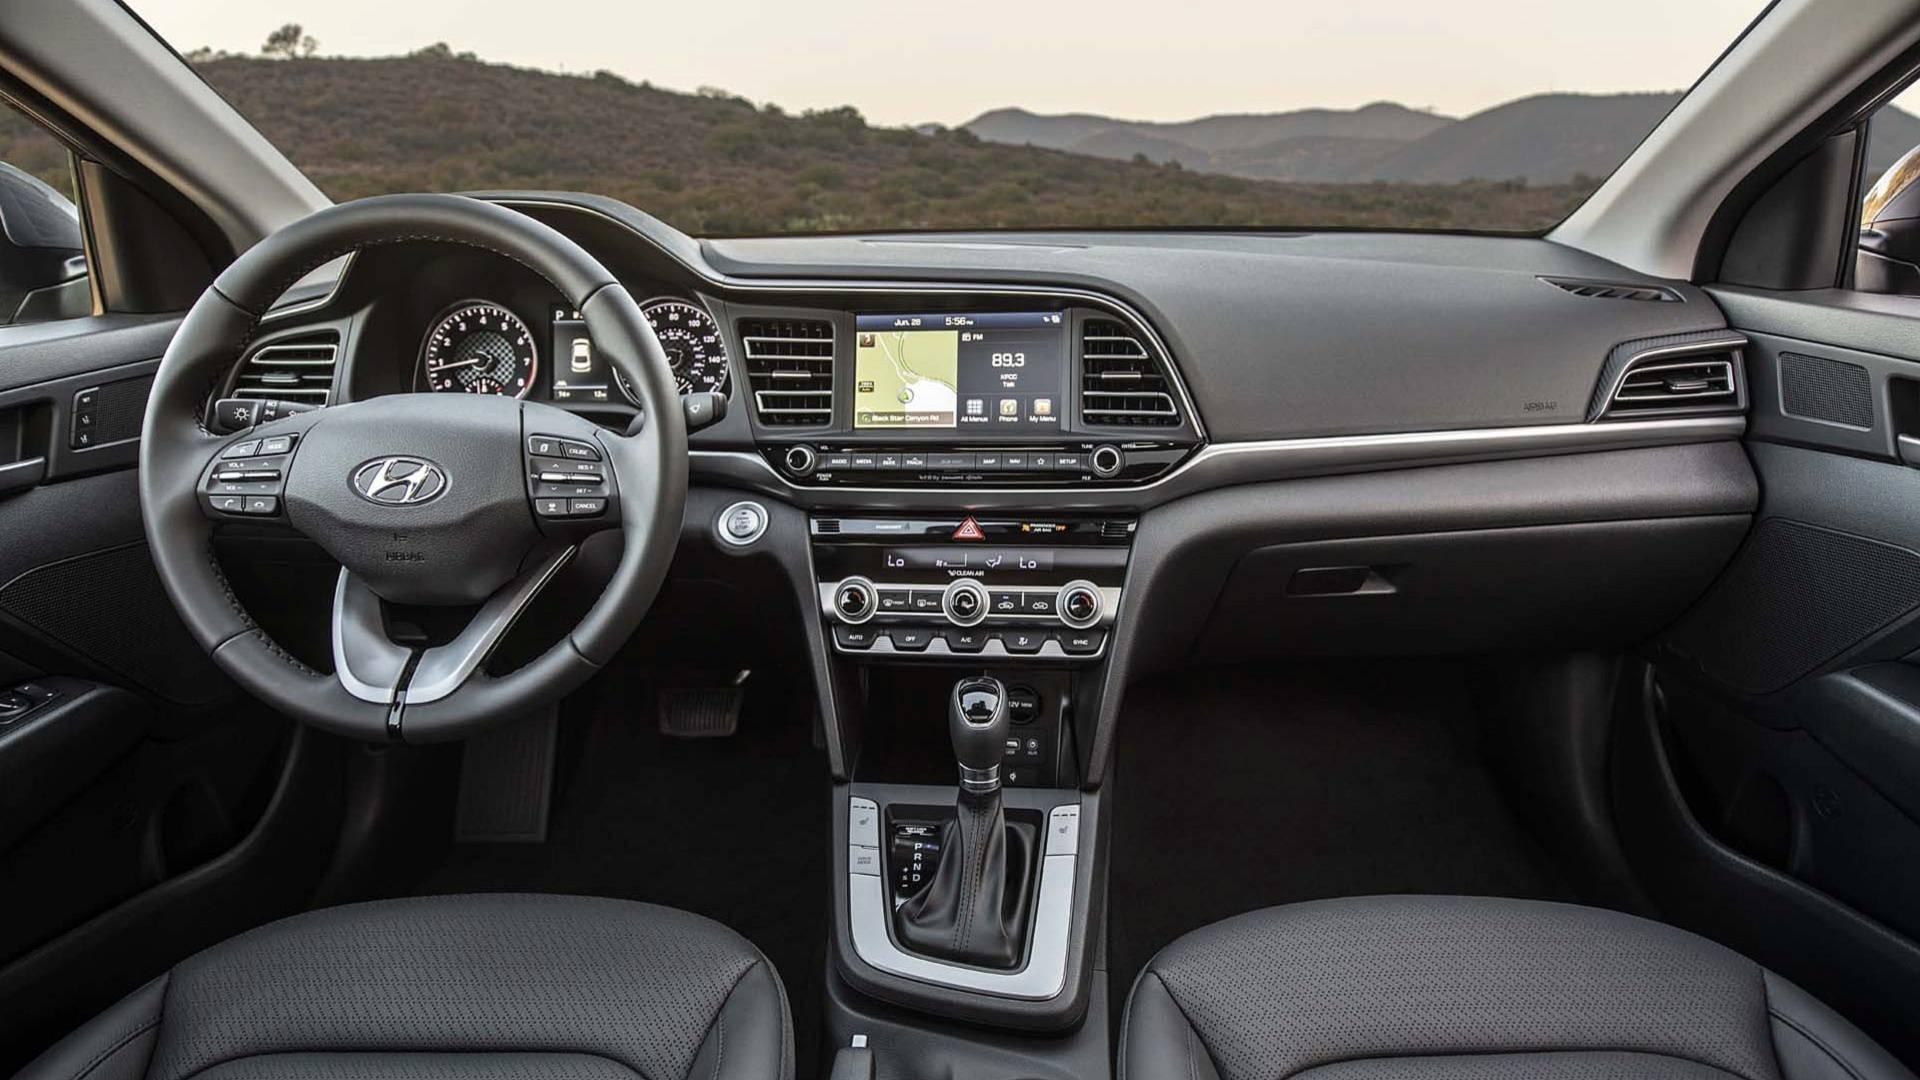 Hyundai Elantra 2019 (43)